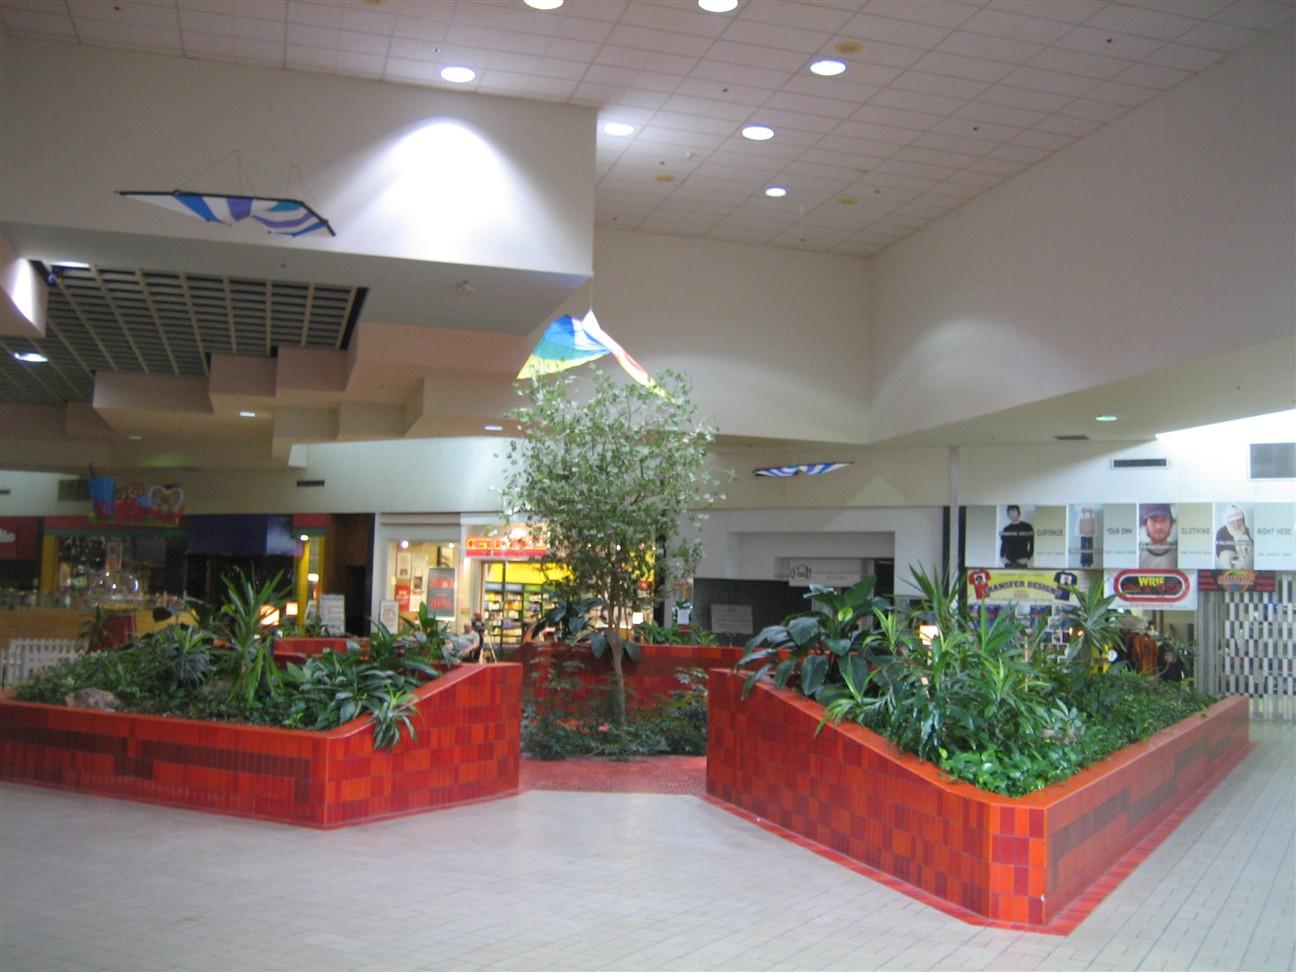 livonia-mall-02.jpg